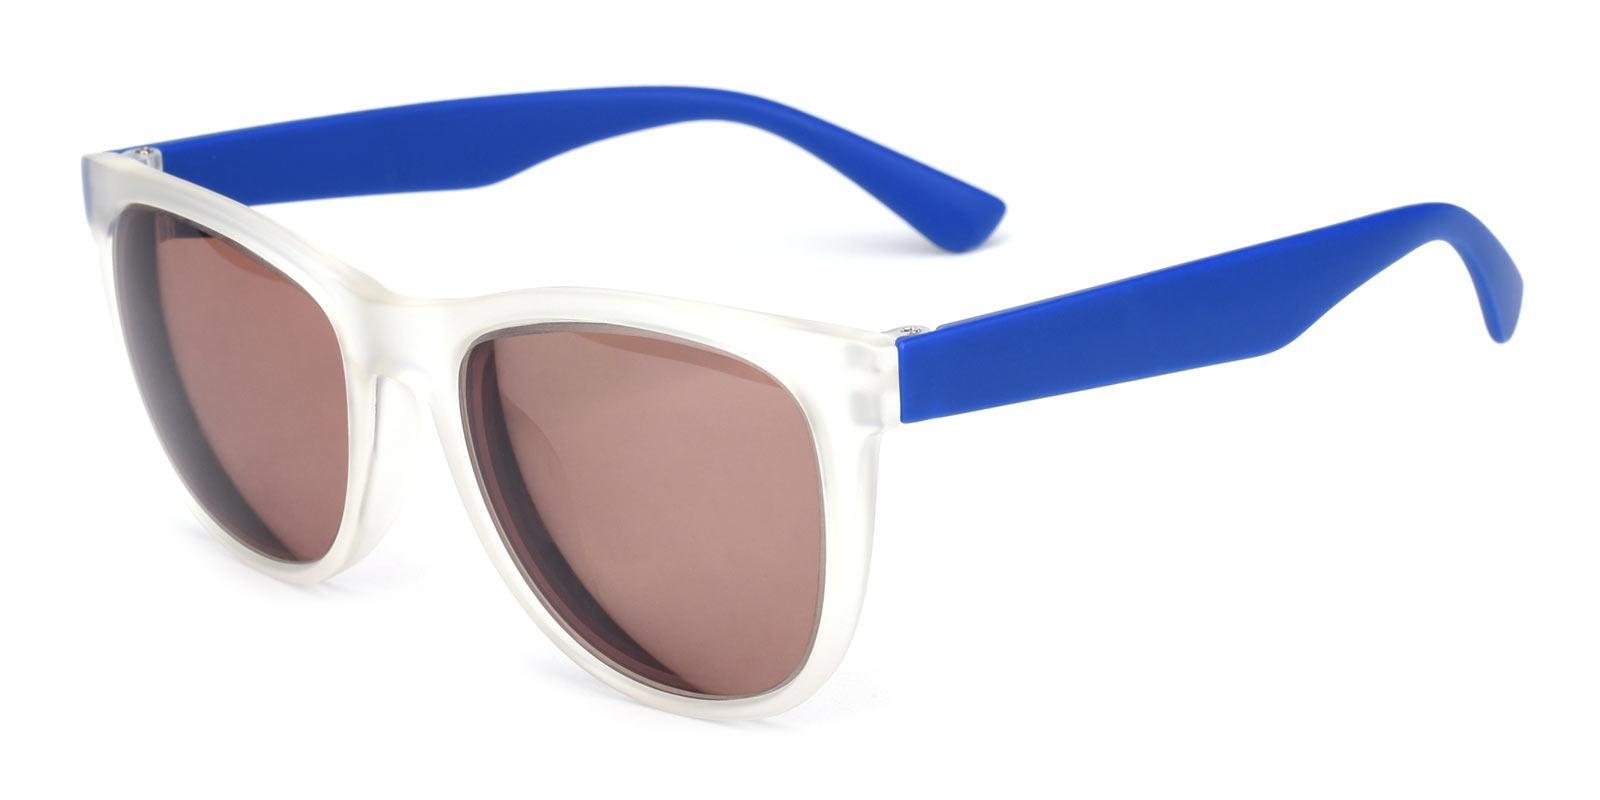 Malibu-Translucent-Cat-TR-Sunglasses-additional1